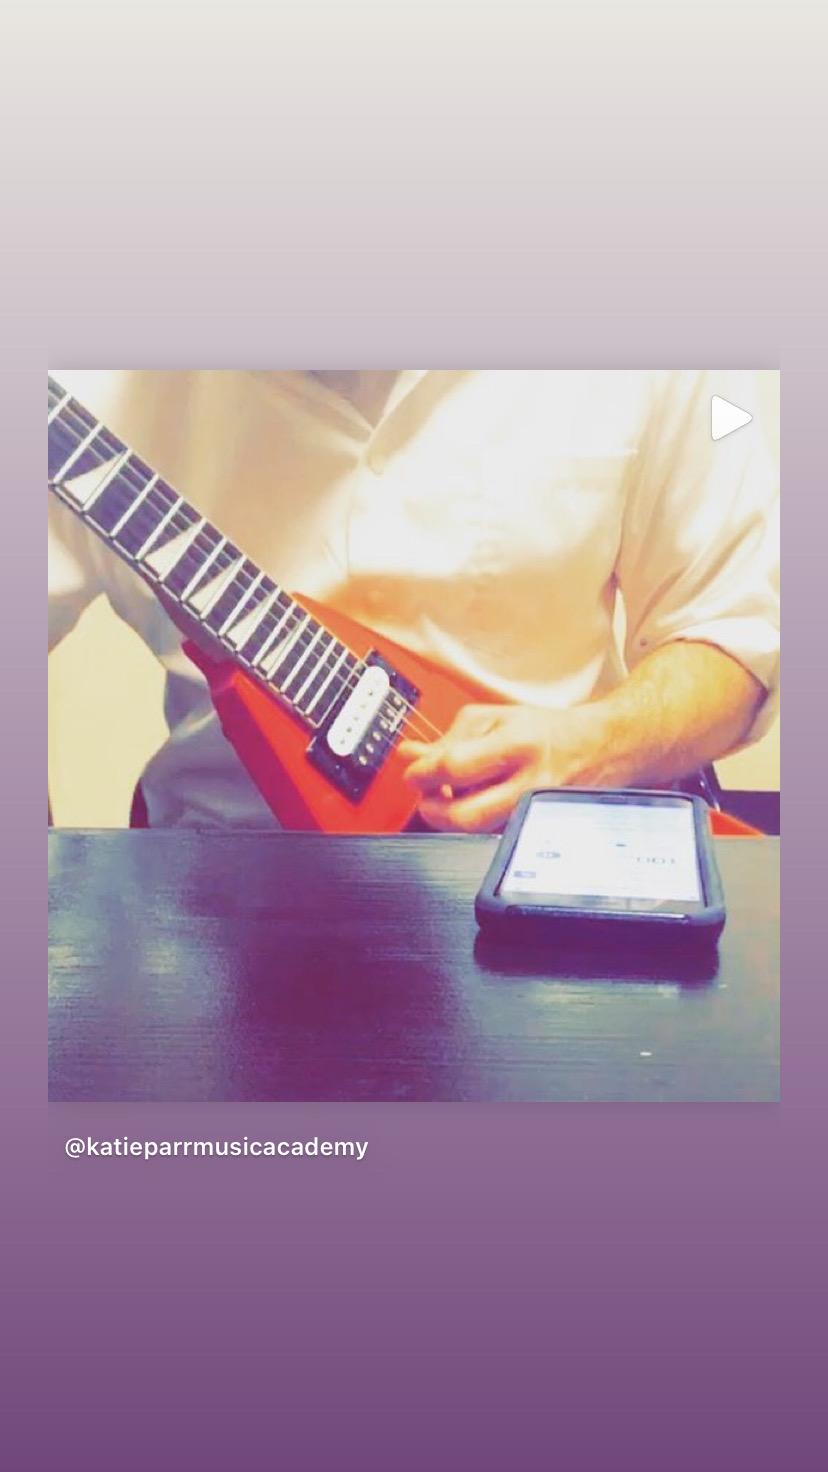 Kyle Honea Guitar Lessons - school  | Photo 10 of 10 | Address: 2012 E State Hwy 114, Southlake, TX 76092, USA | Phone: (469) 996-5882